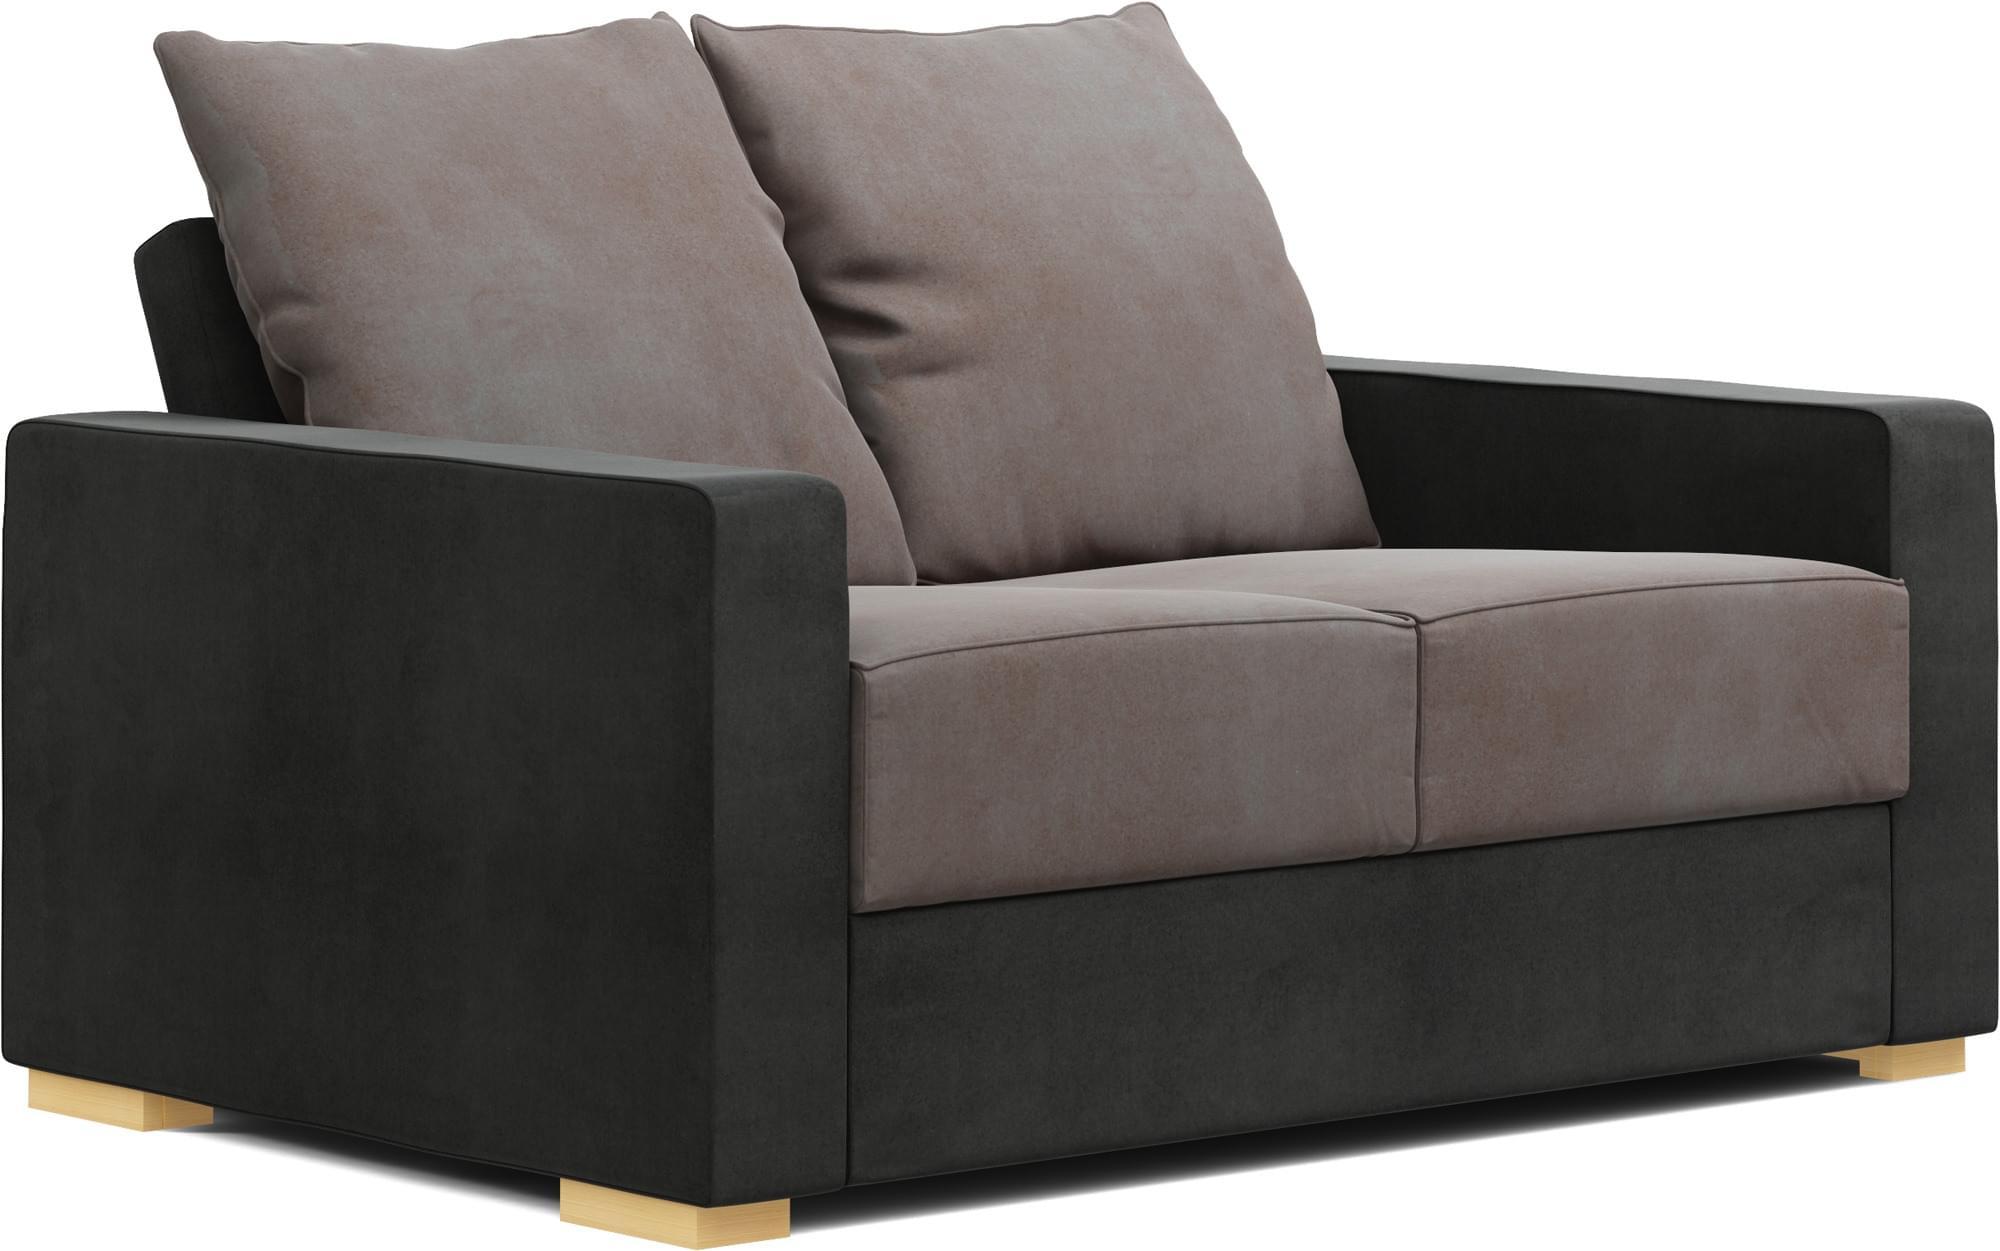 Tor 2 Seat Sofa Bed   Narrow Sofa Bed   Nabru